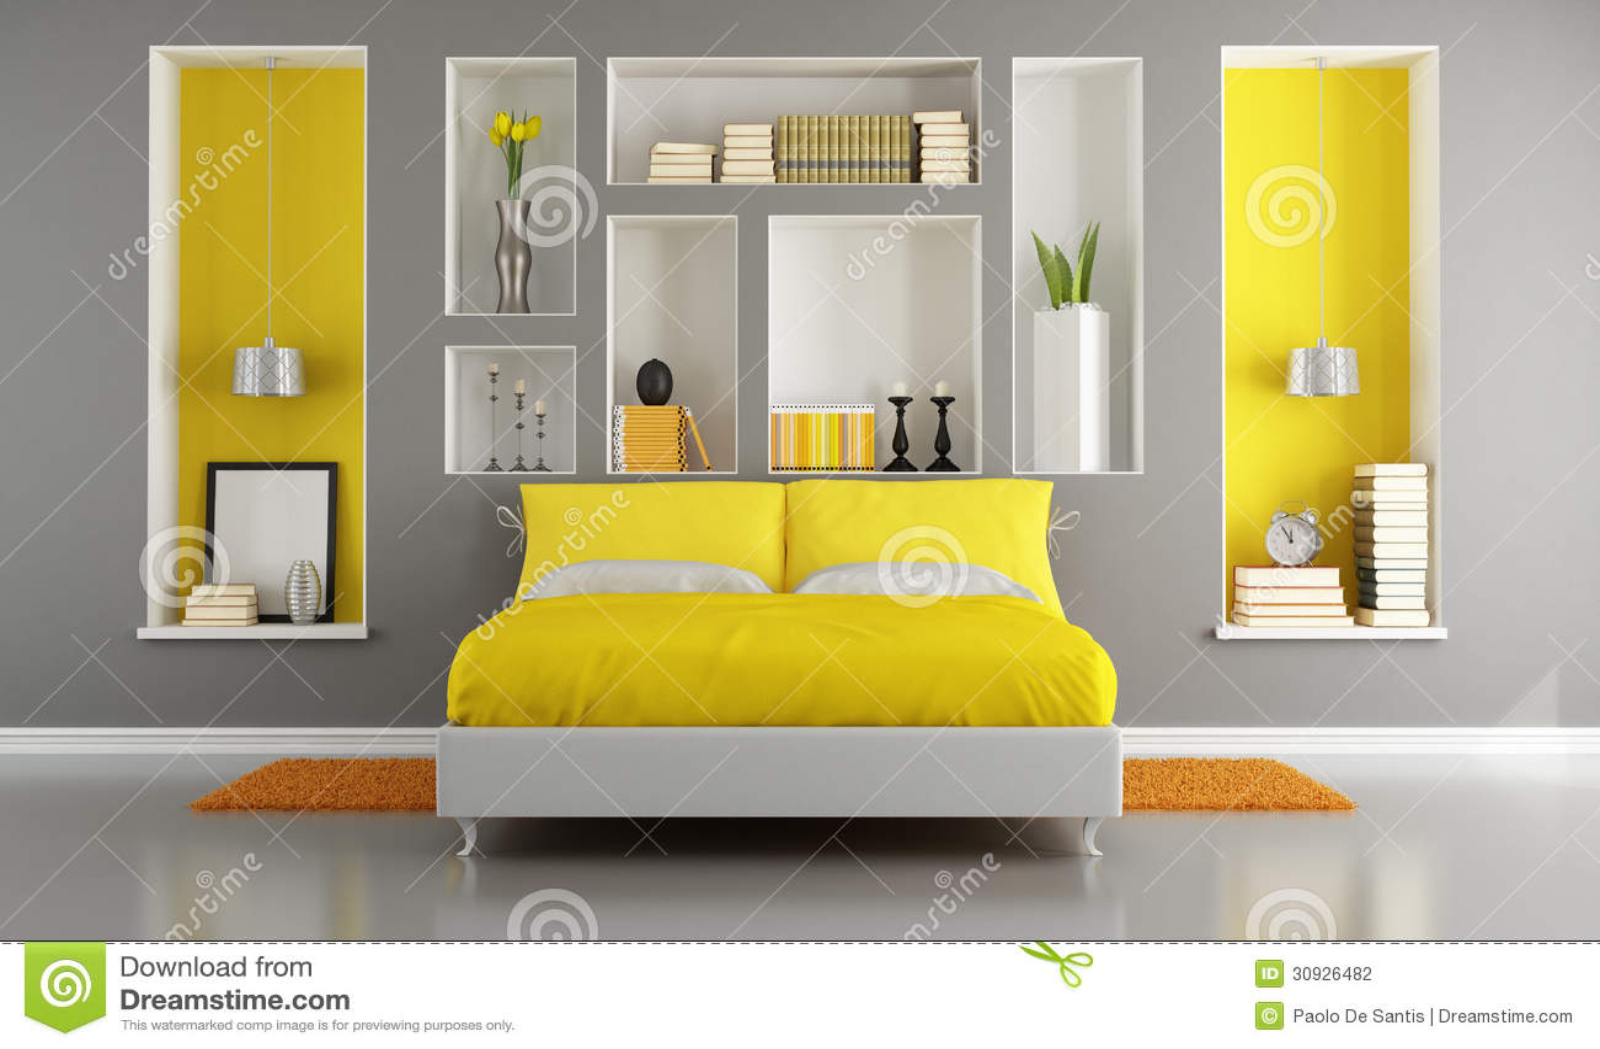 chambre coucher moderne jaune et grise. Black Bedroom Furniture Sets. Home Design Ideas